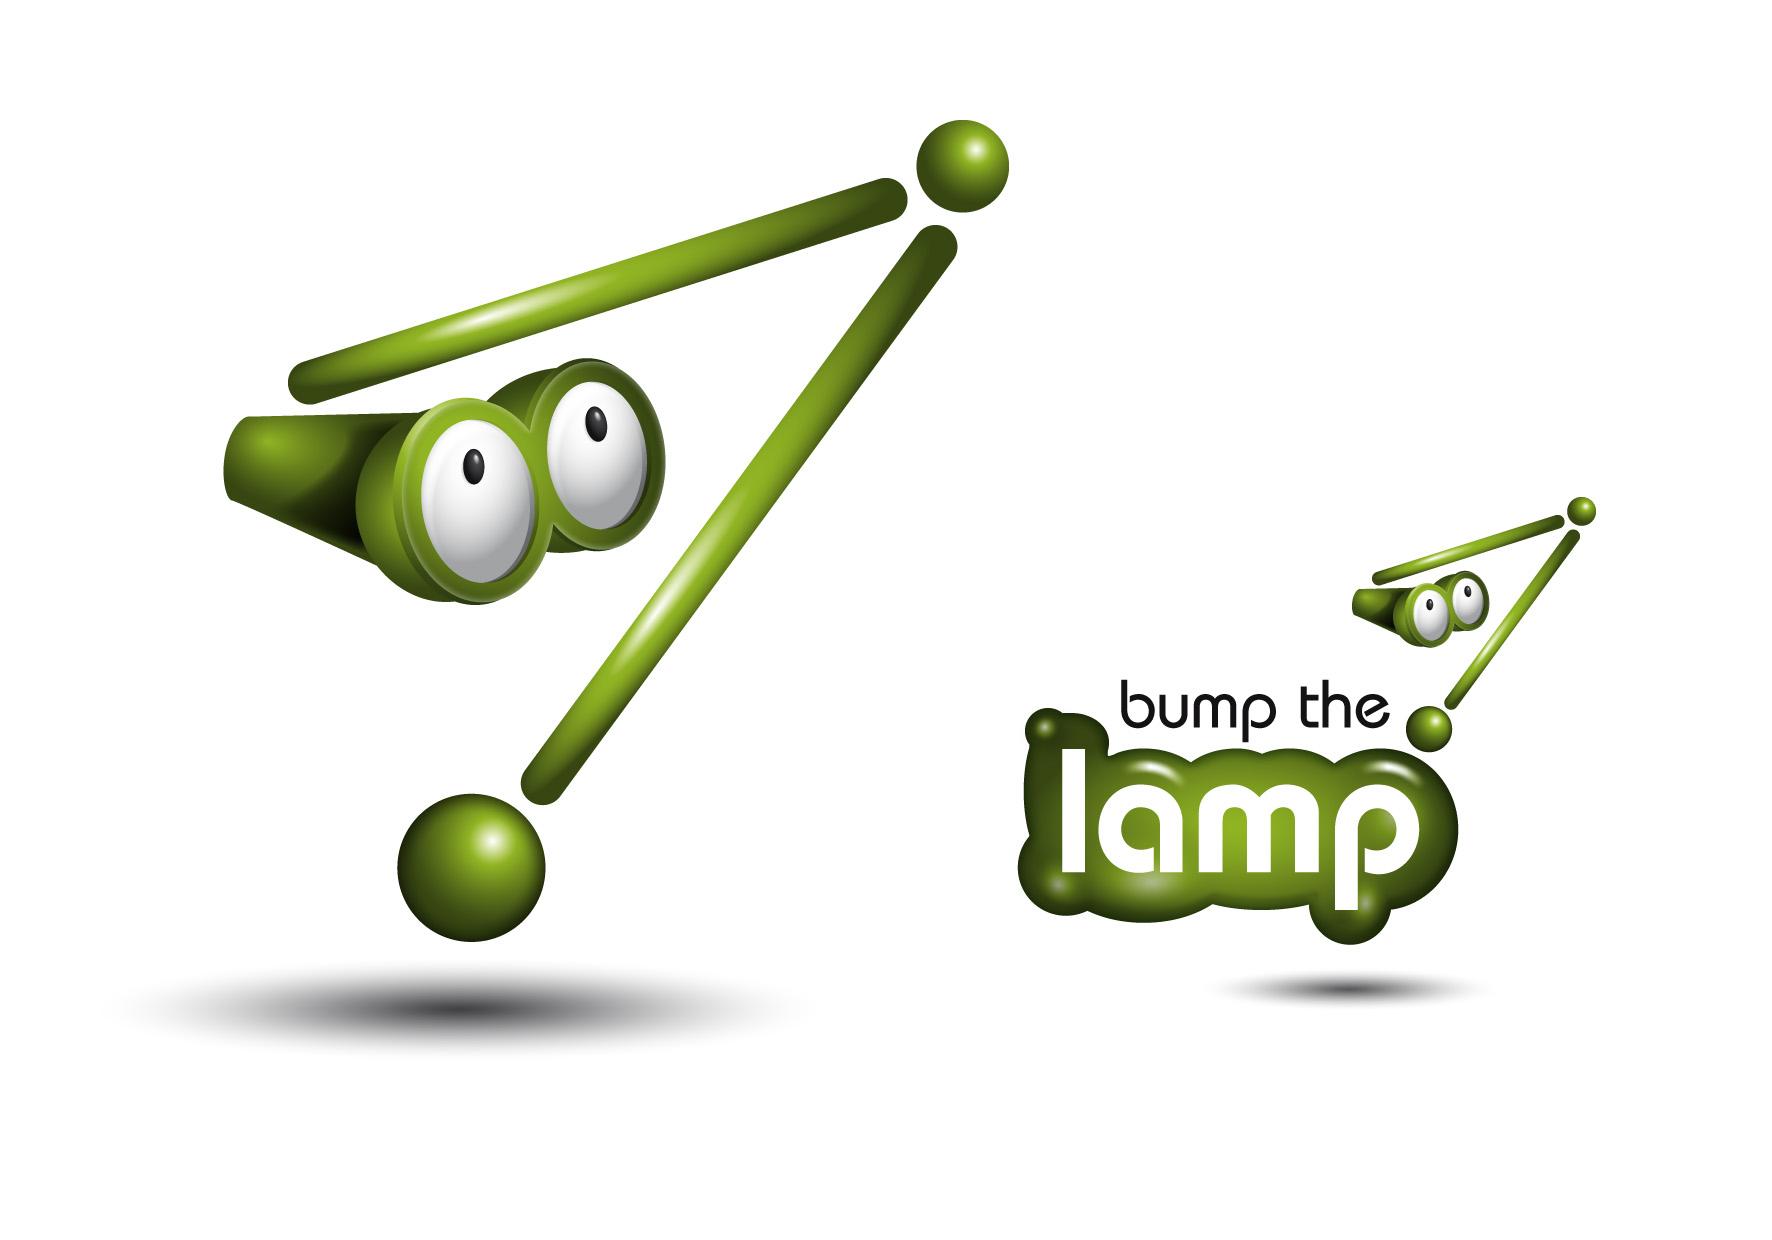 Bump the Lamp